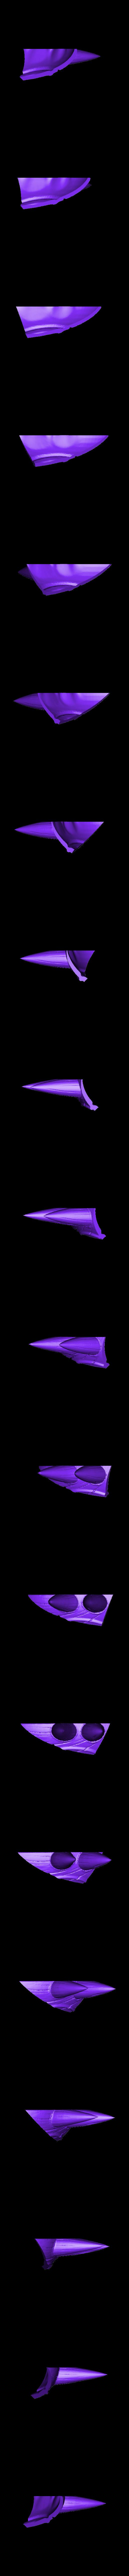 AI3M_R-mid-horns.stl Download free STL file Wall Mount for Majora's Mask (full size) • 3D printer model, 3DPrintDogs